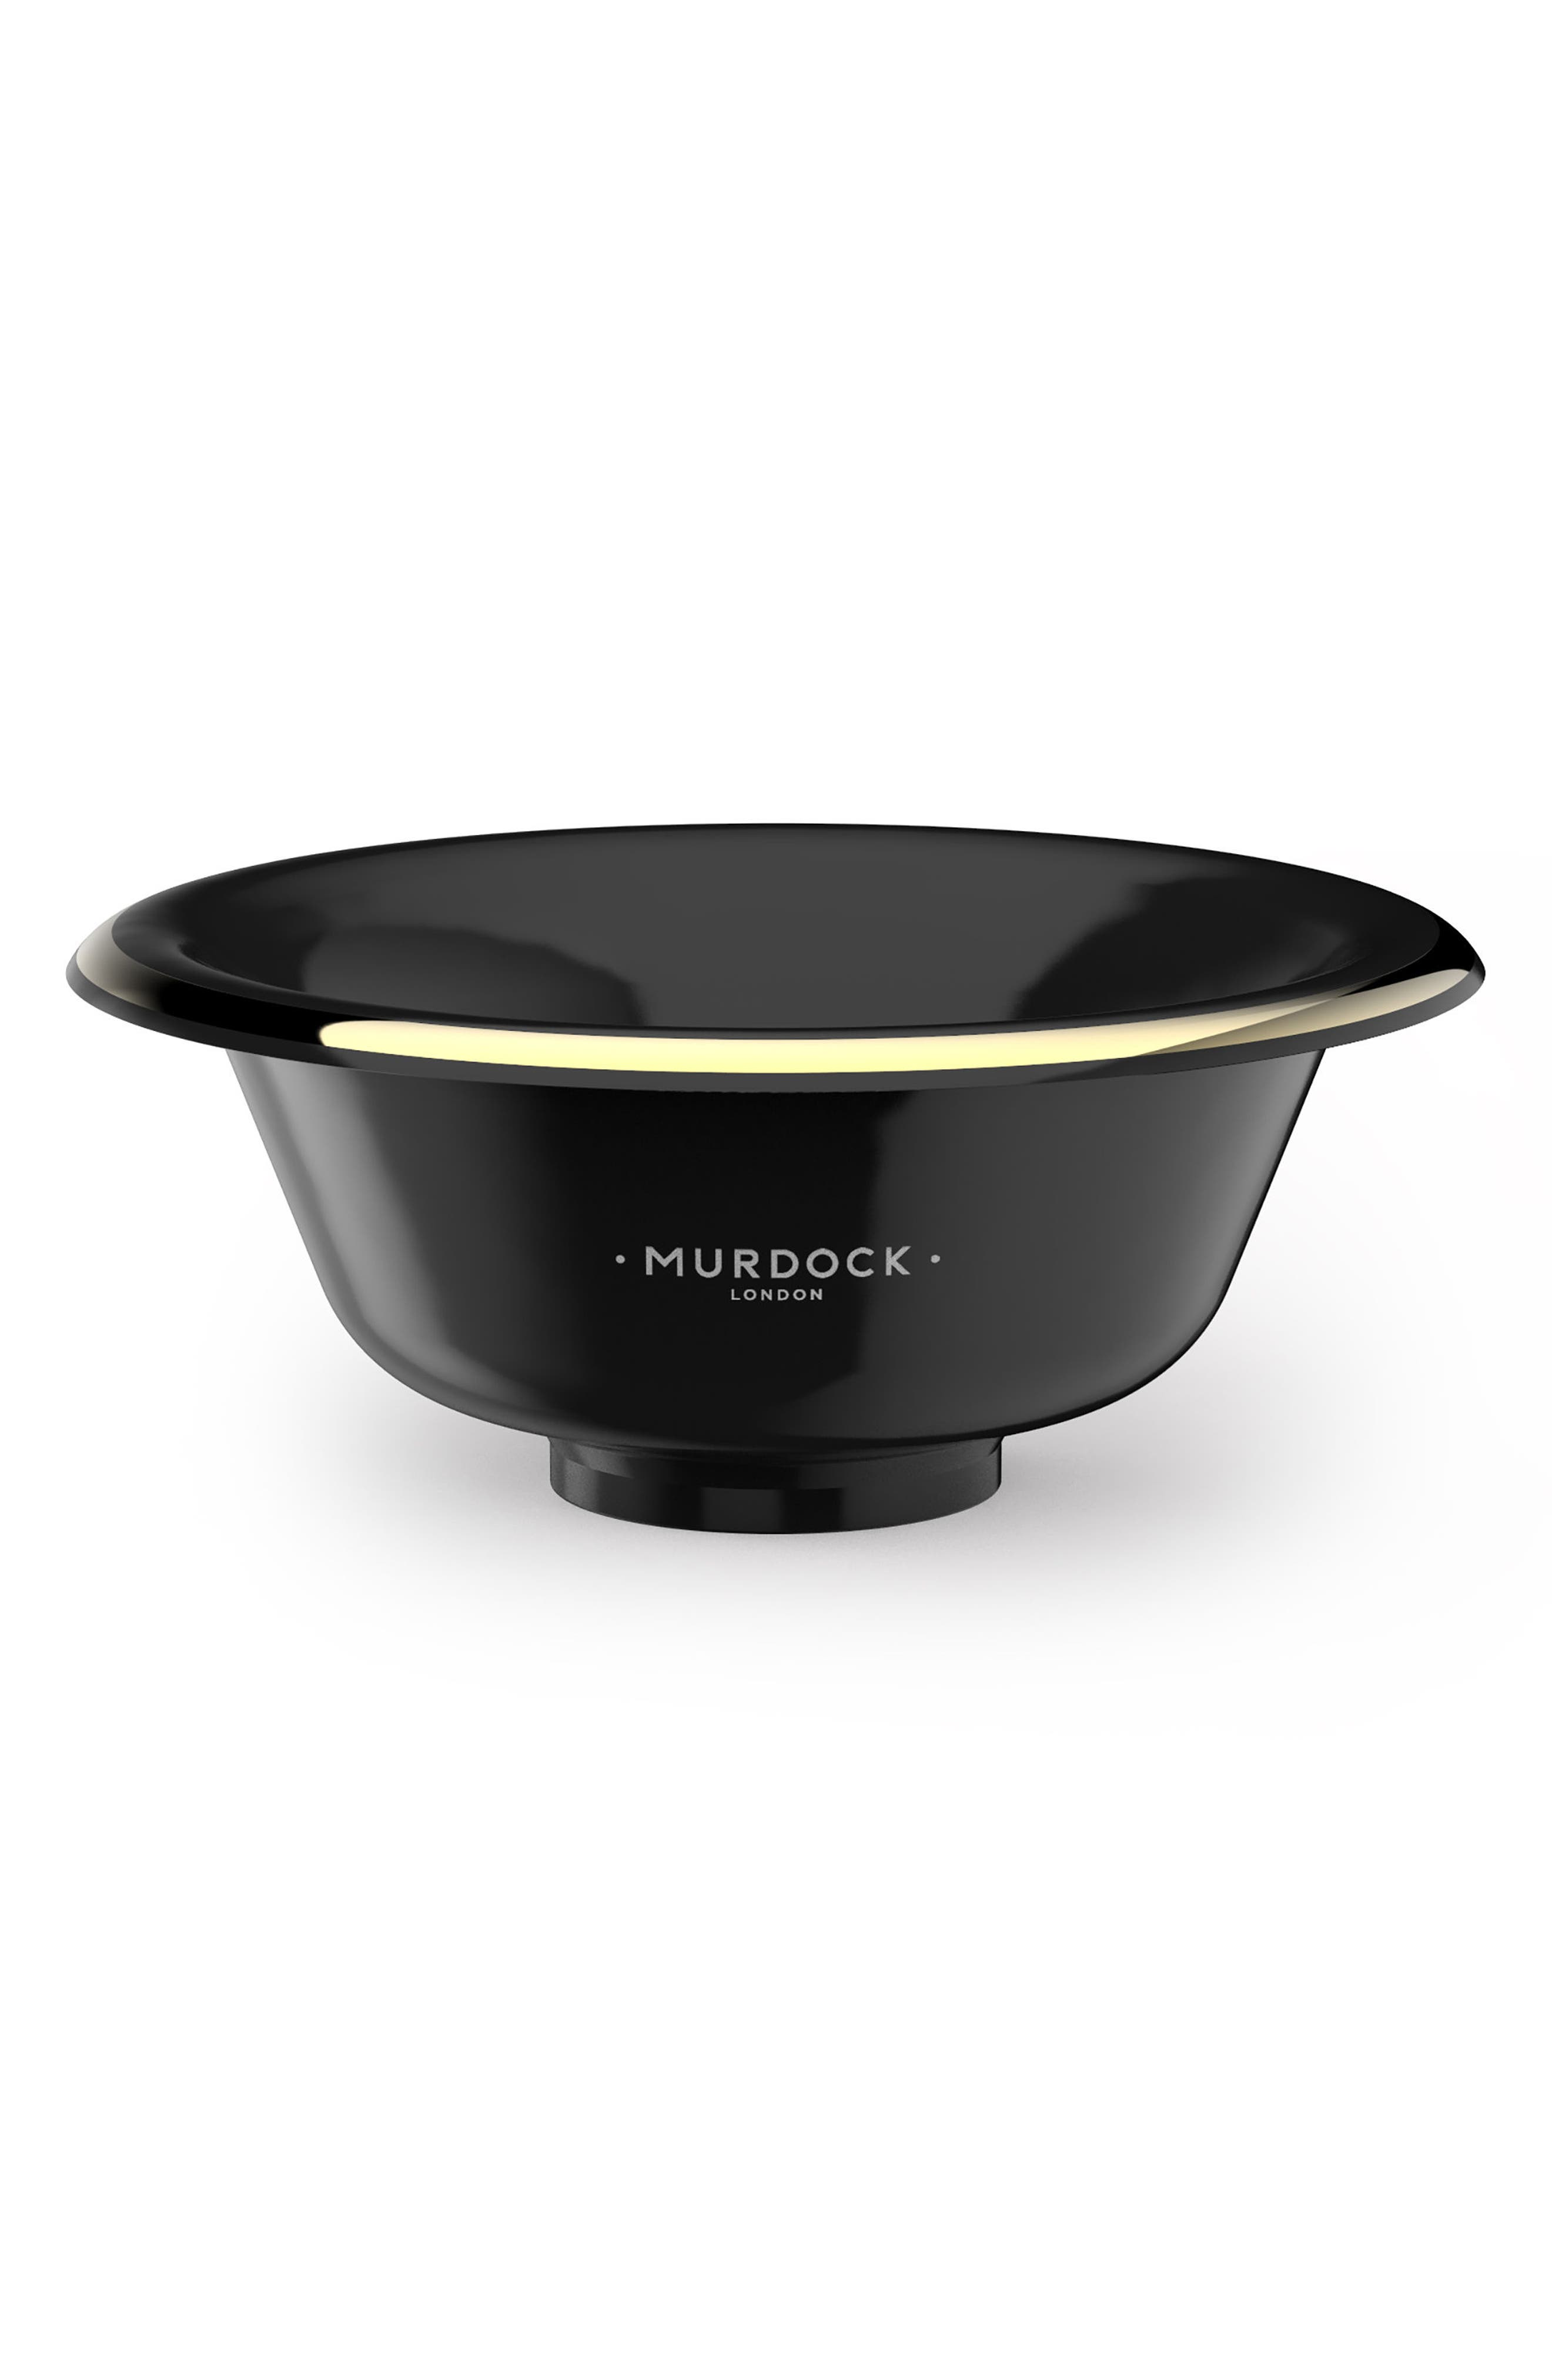 Murdock London Shave Bowl (Nordstrom Exclusive)